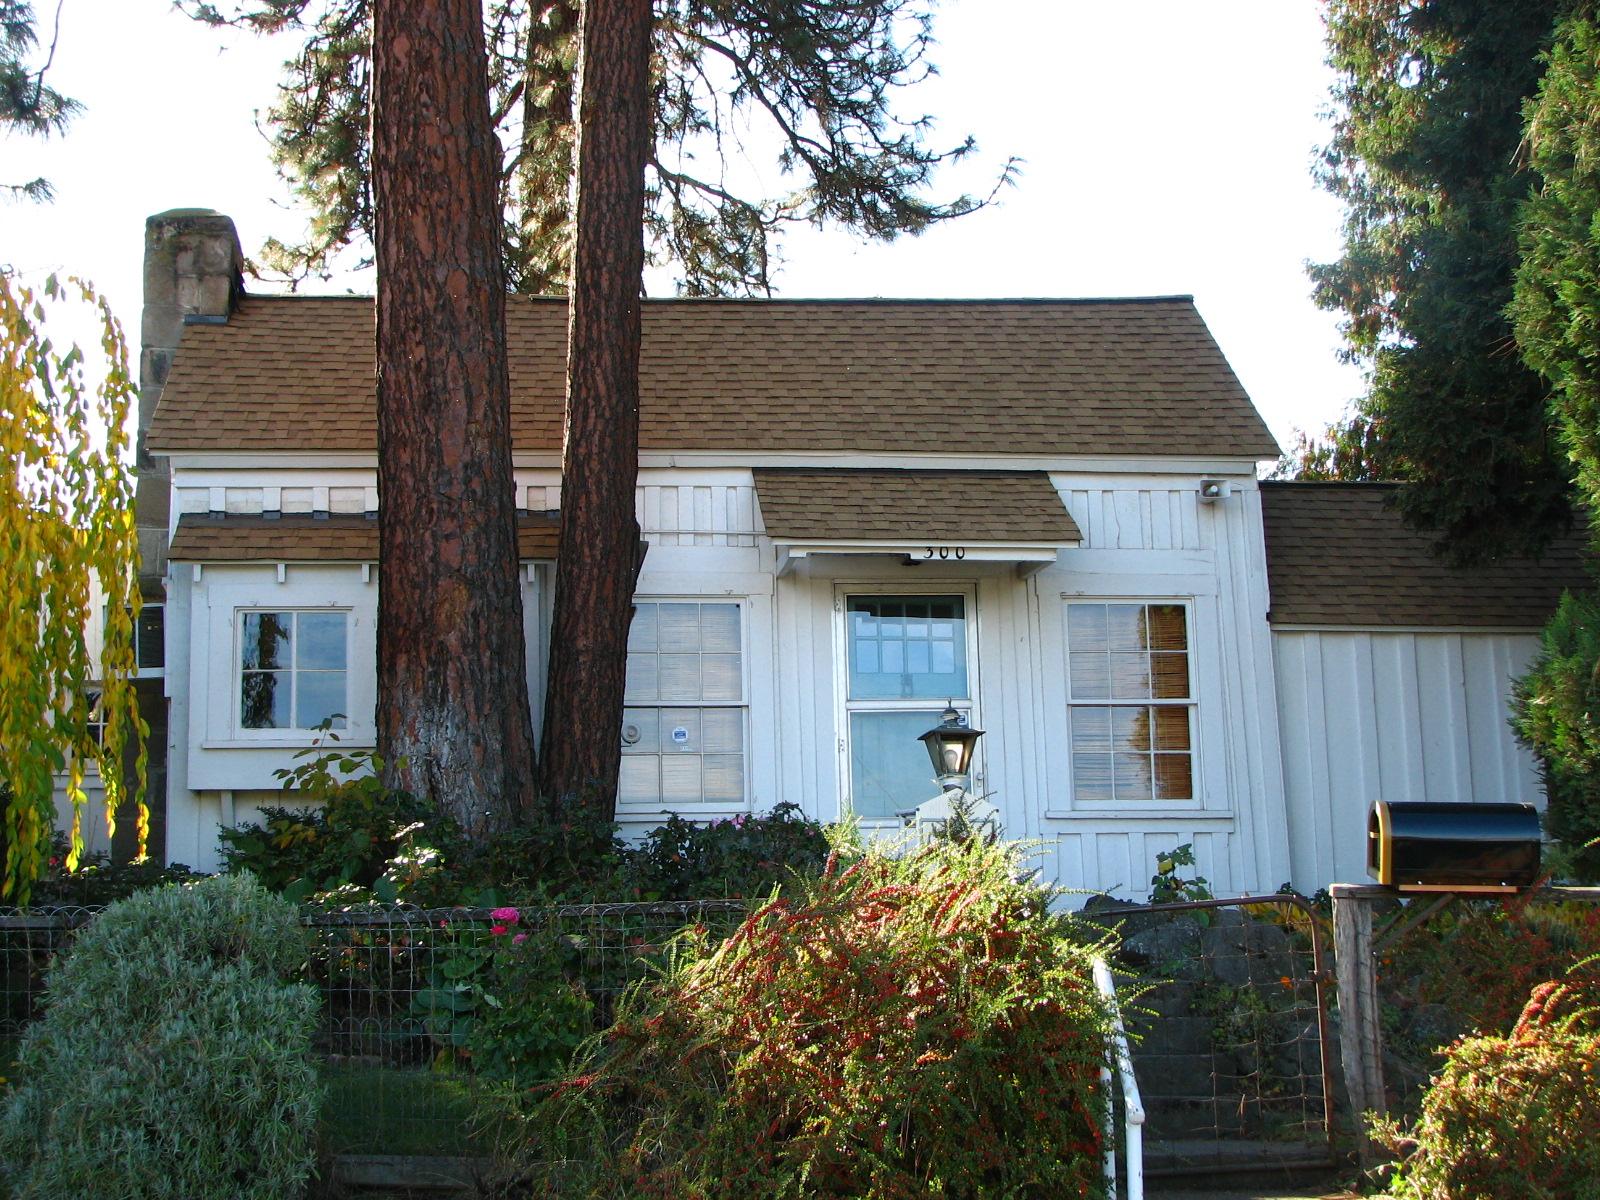 Rorick House Museum